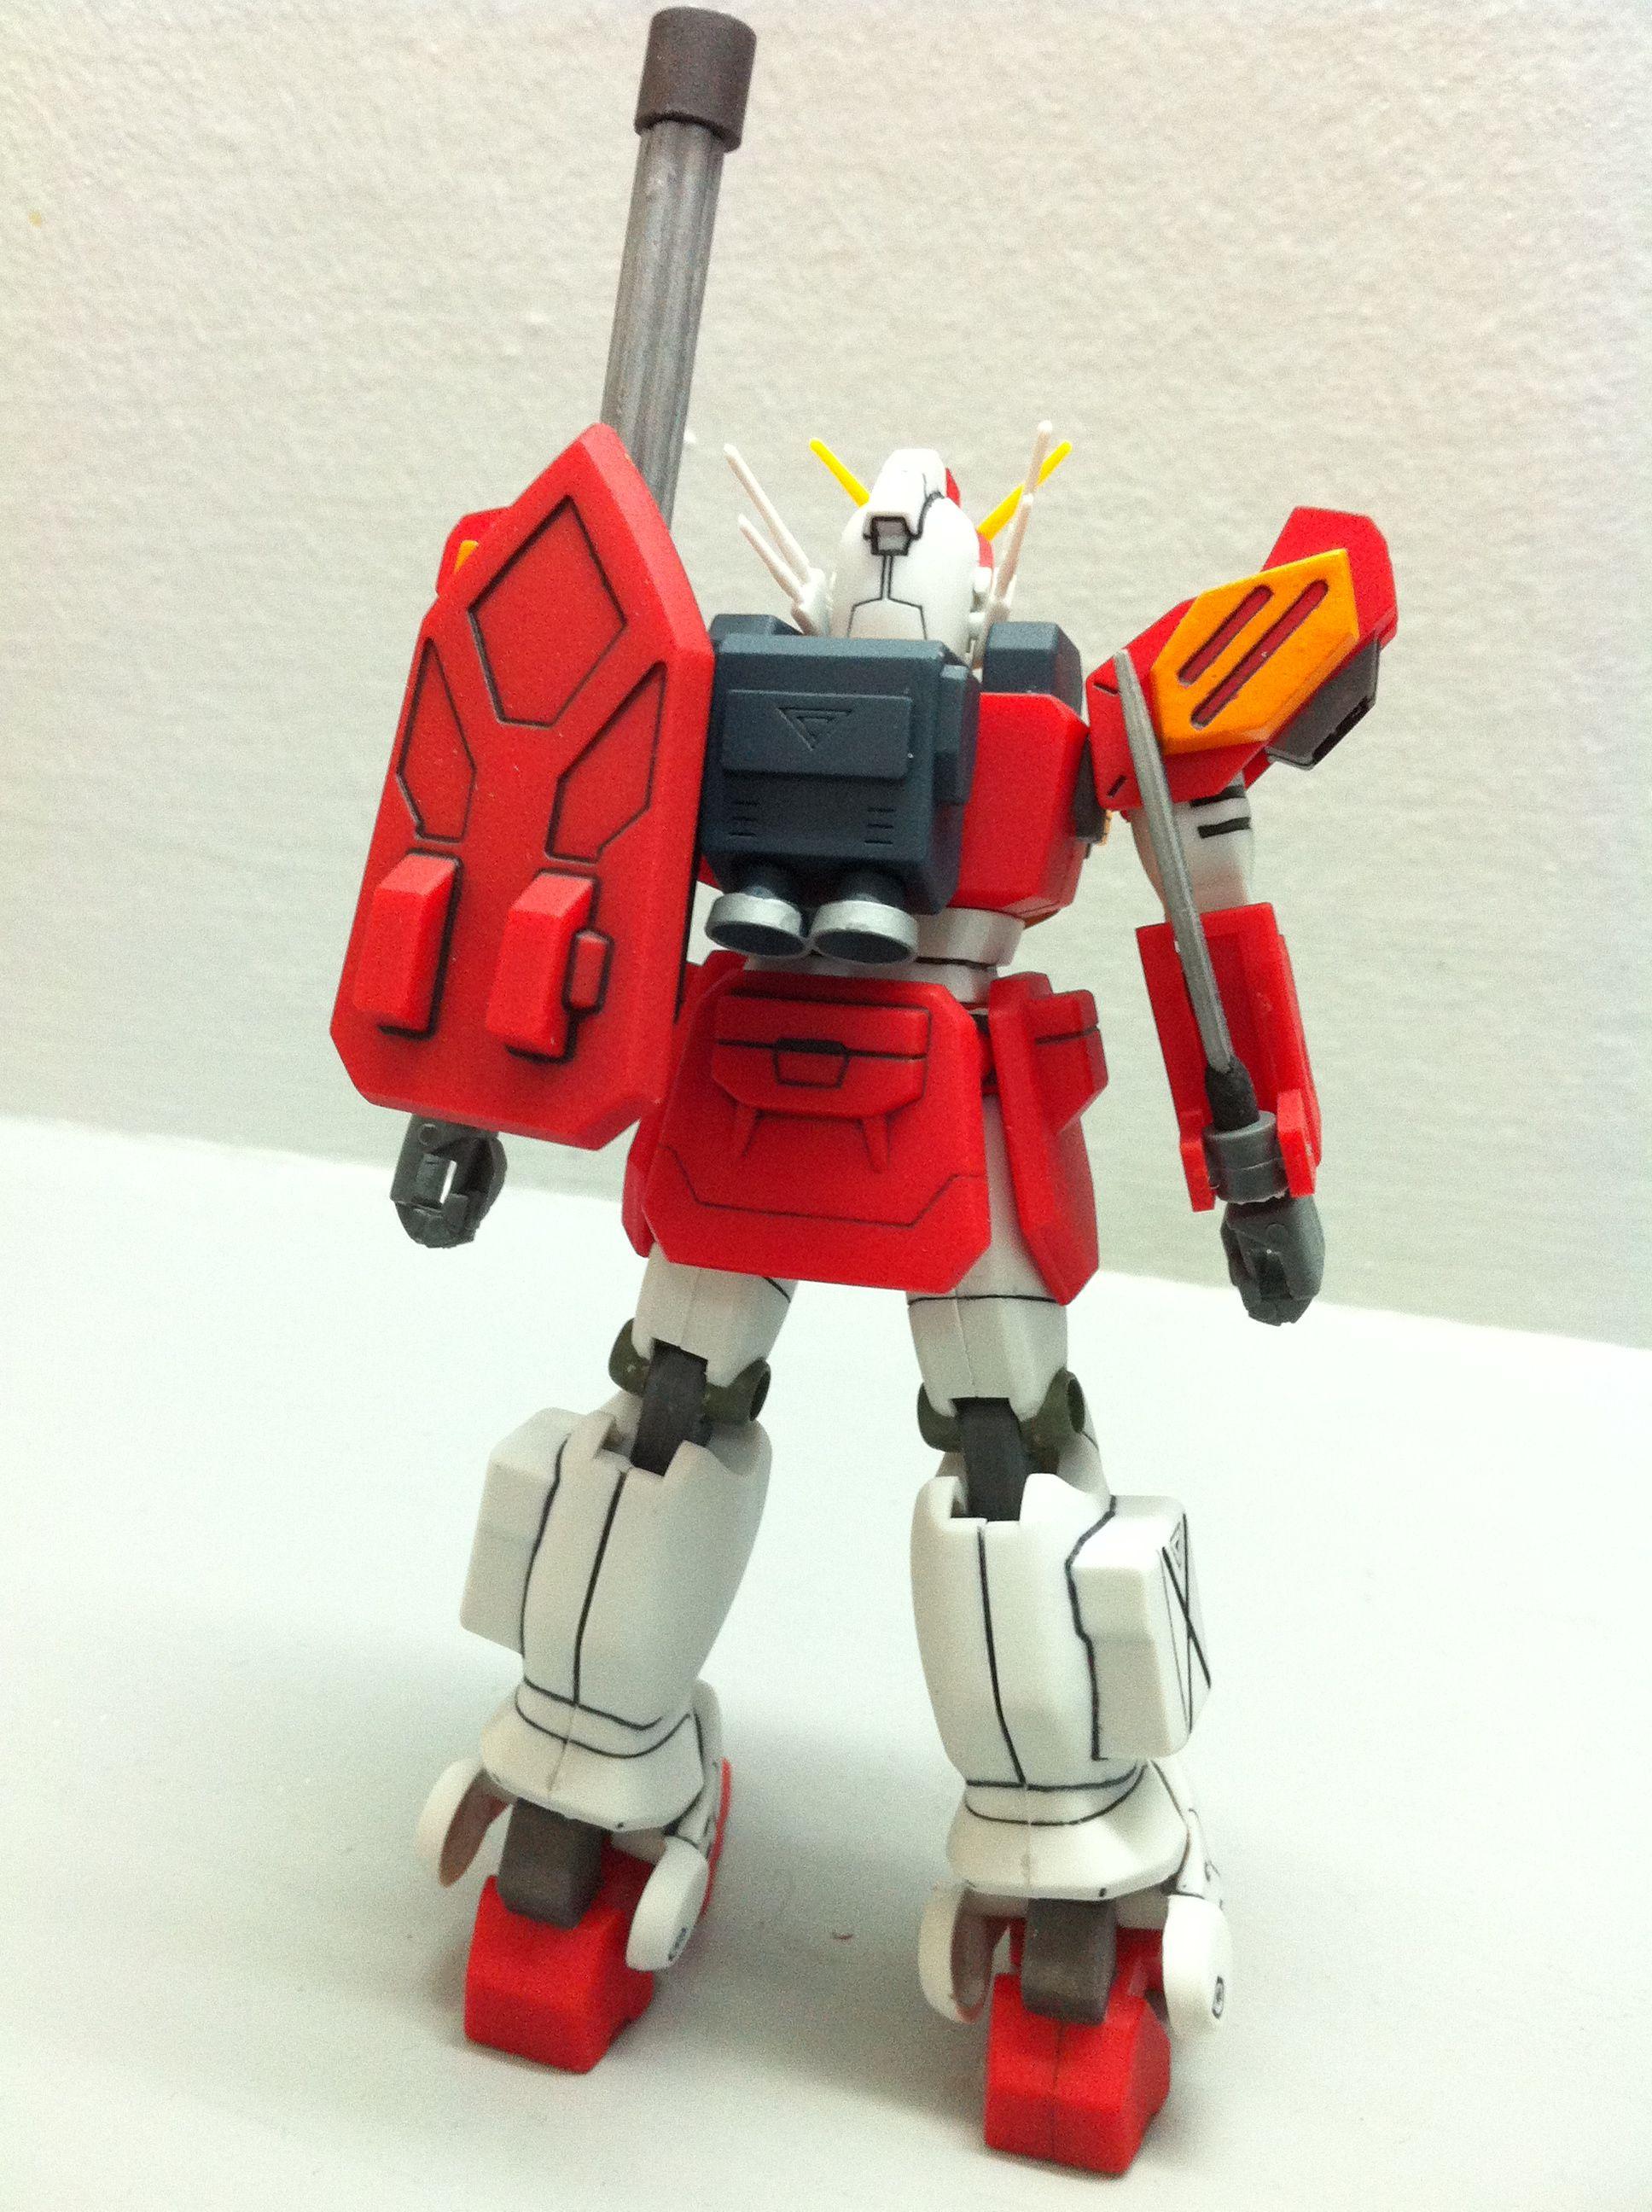 Back View No Grade 1 144 Gundam Heavy Arms Gunpla Mg Rx78 2 Verka 114215 Bandai